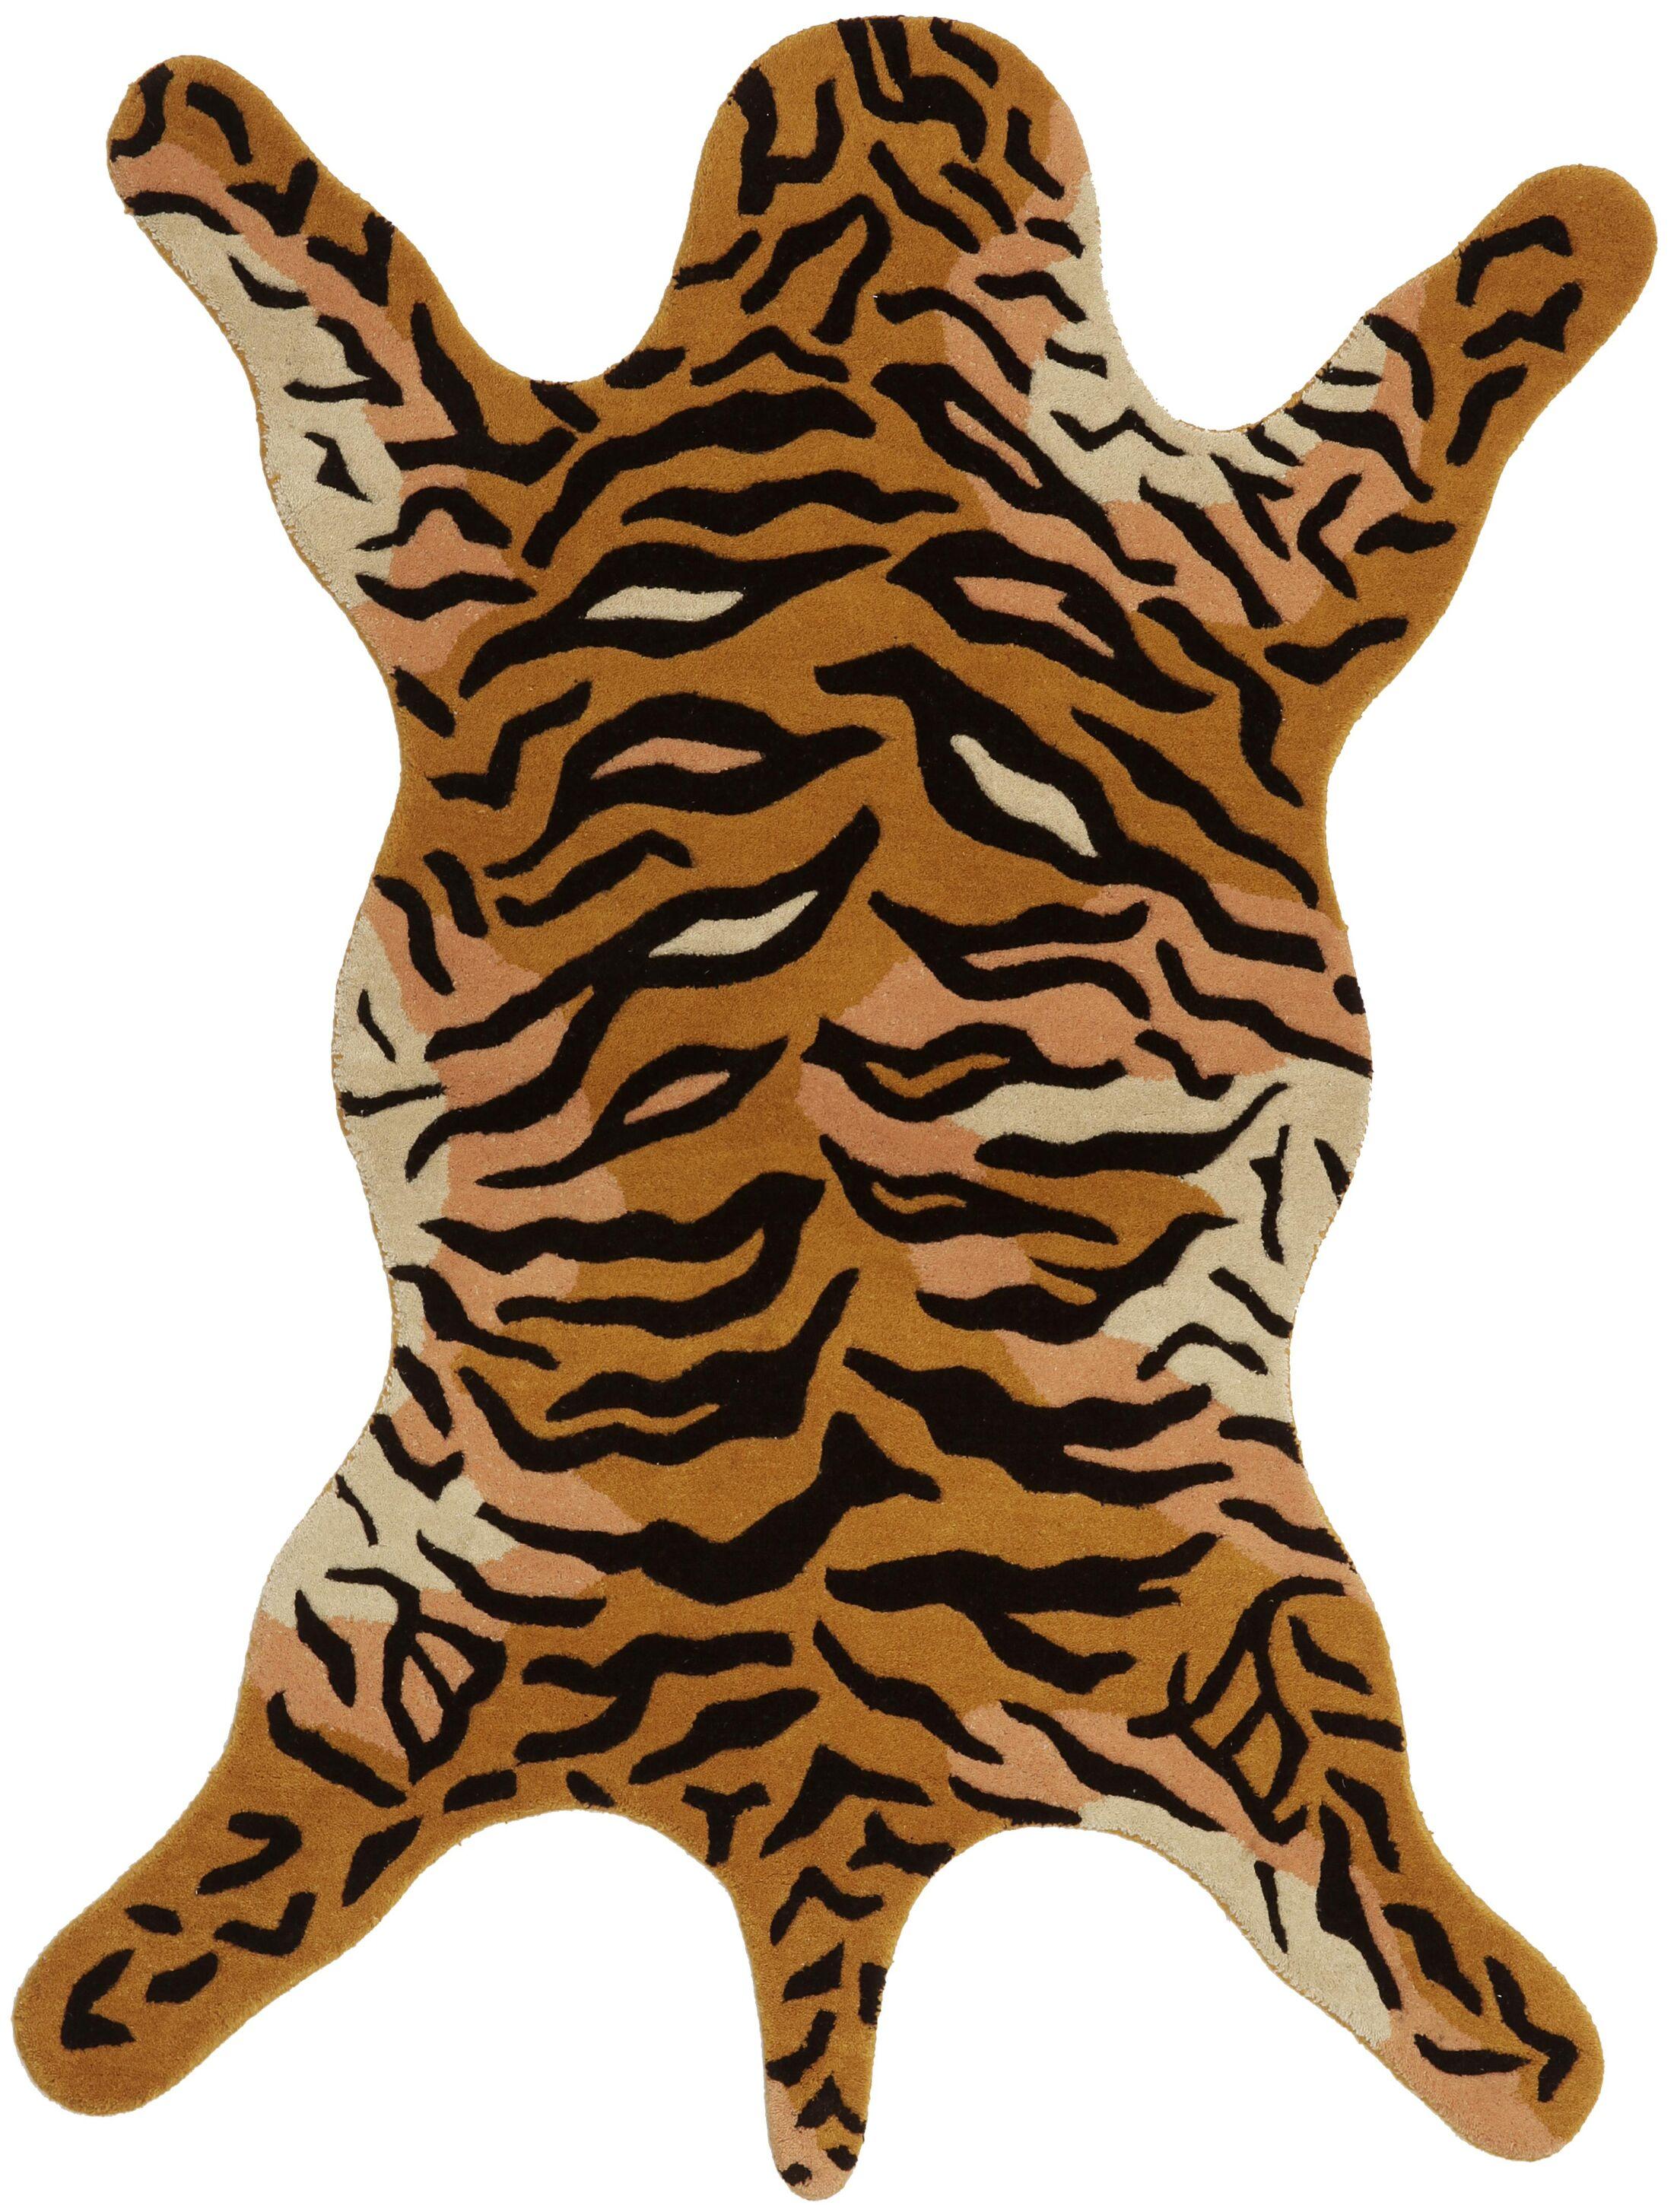 Safari Orange Tiger Area Rug Rug Size: 4' x 6'